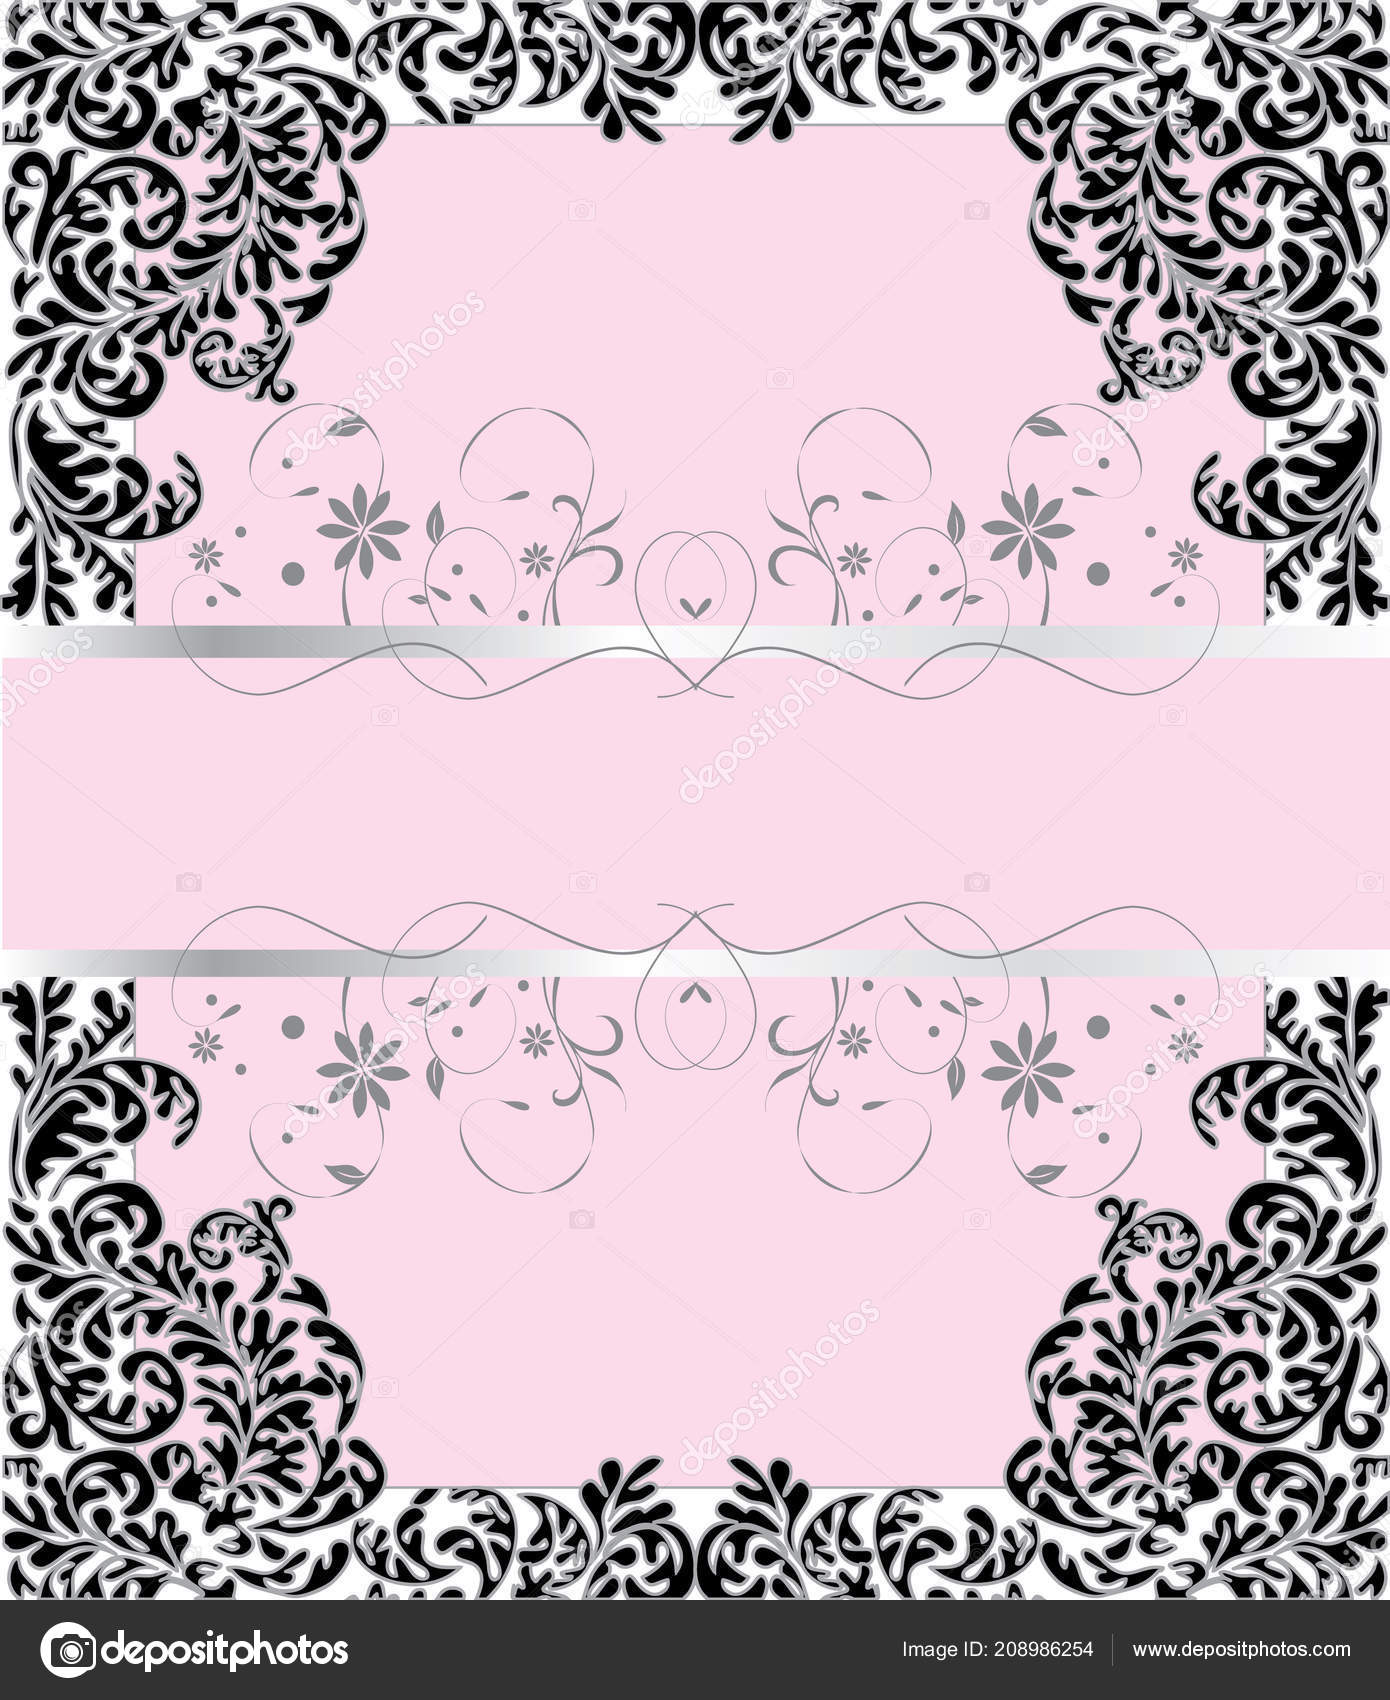 vintage invitation card ornate elegant retro abstract floral design